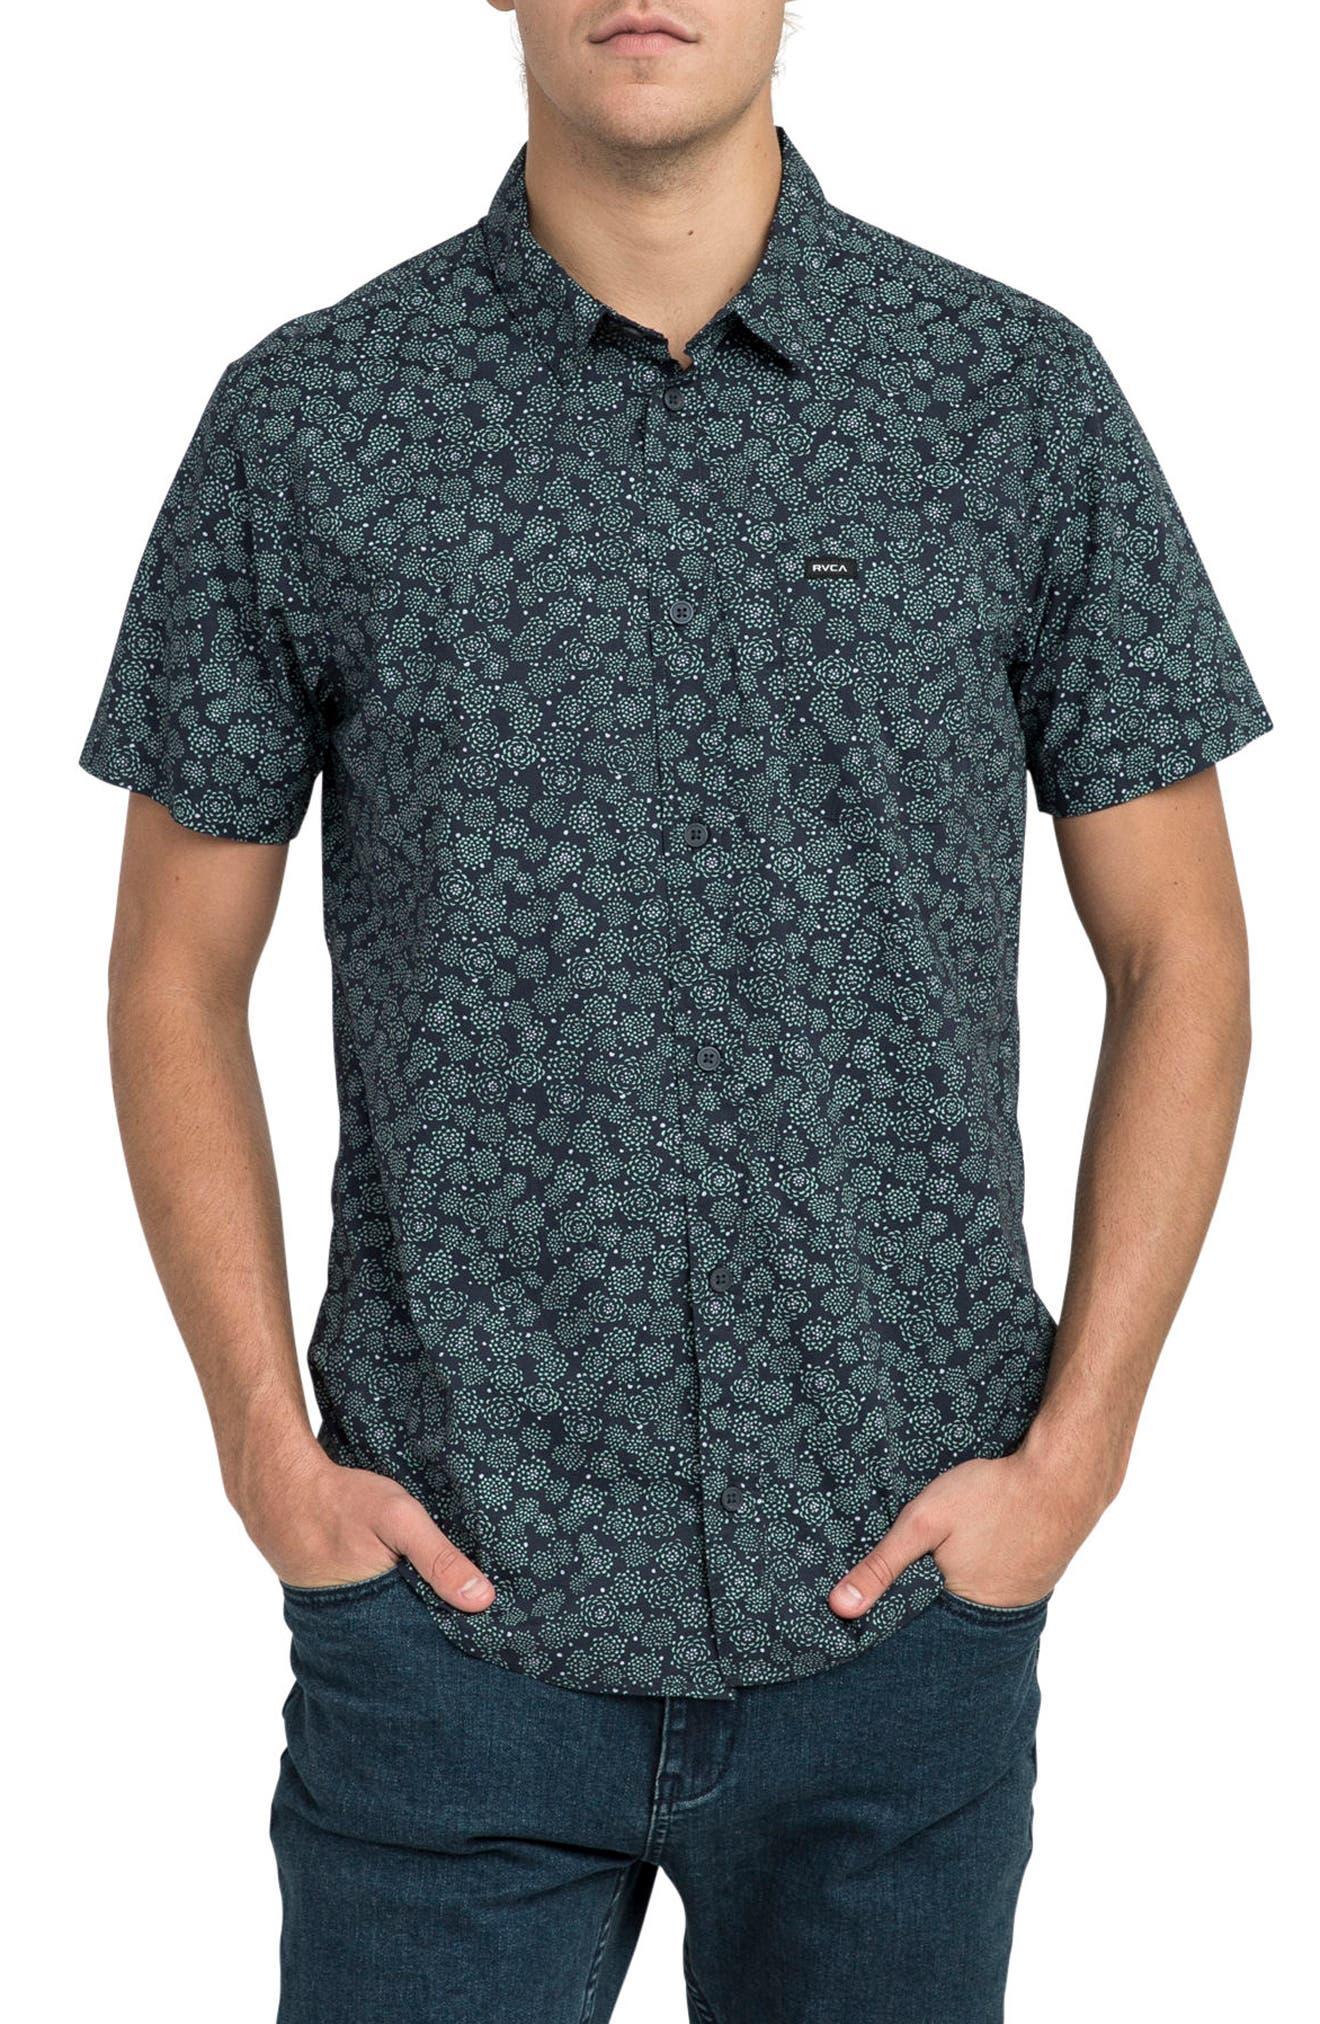 Cleta Woven Shirt,                             Main thumbnail 1, color,                             415